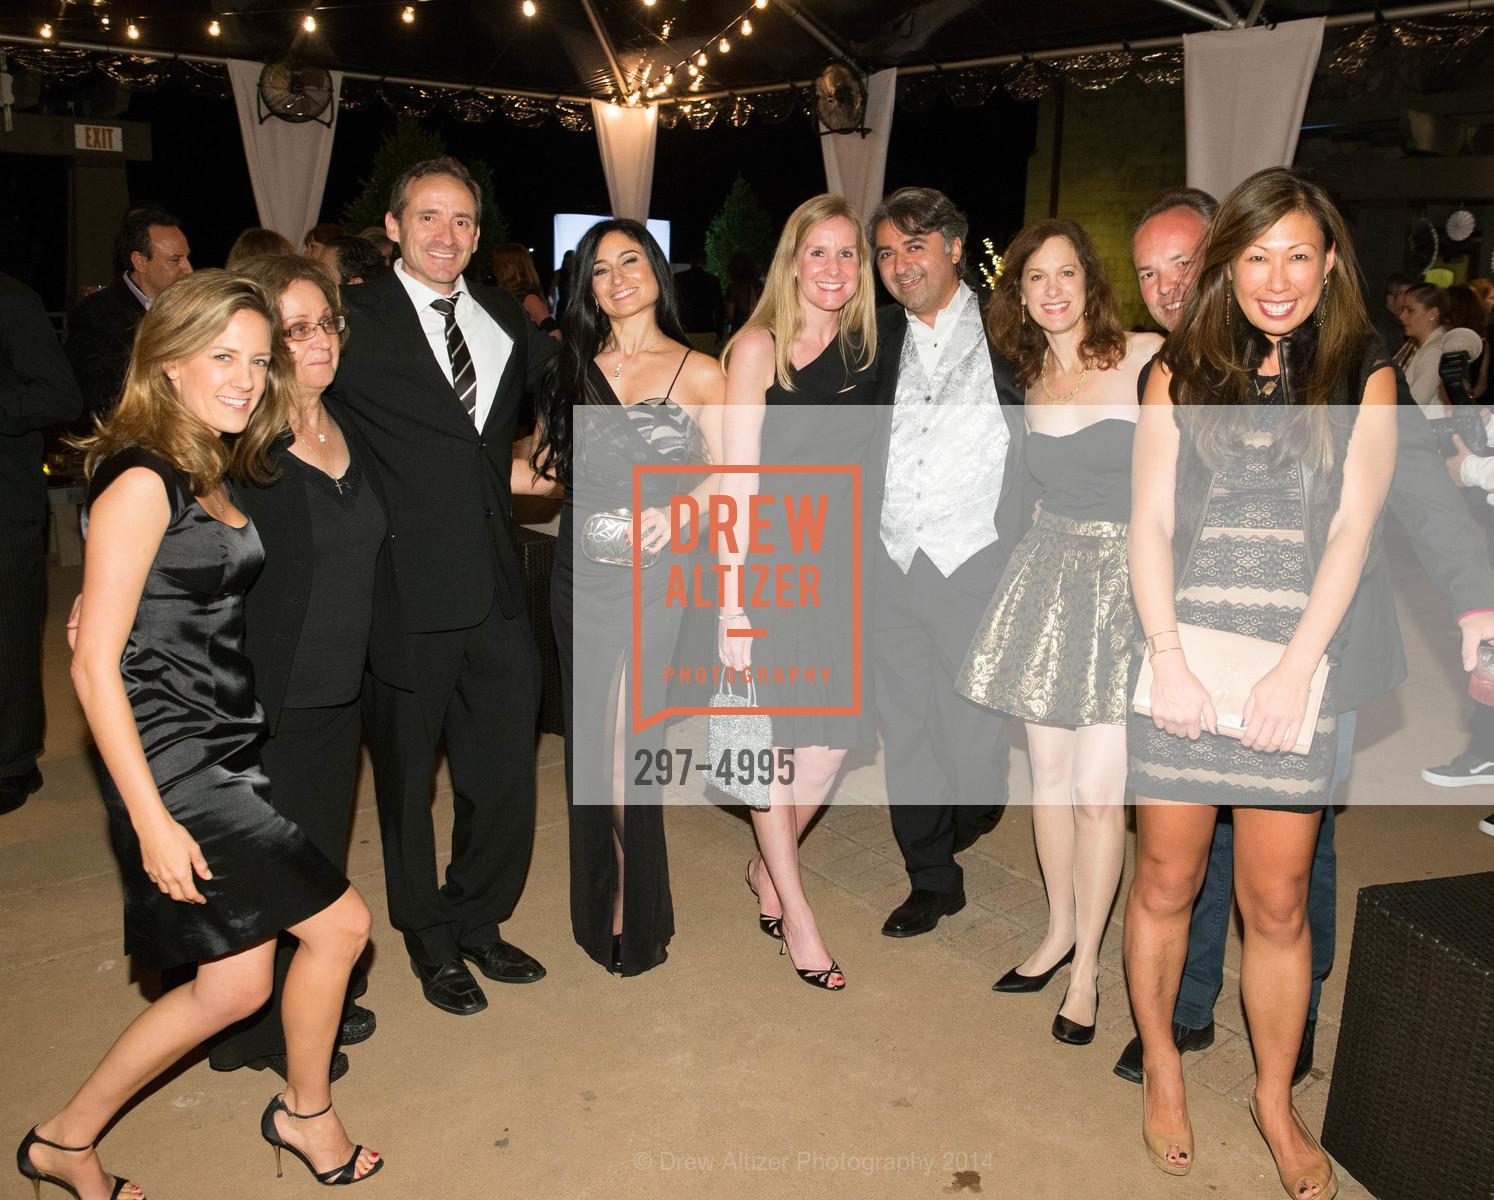 Cecily Olson, Zahra Khalili, Ben Lorenzoni, Leila Rose, Courtney McBain, Hooman Khalili, Alan Azem, Joy Boatwright, Photo #297-4995